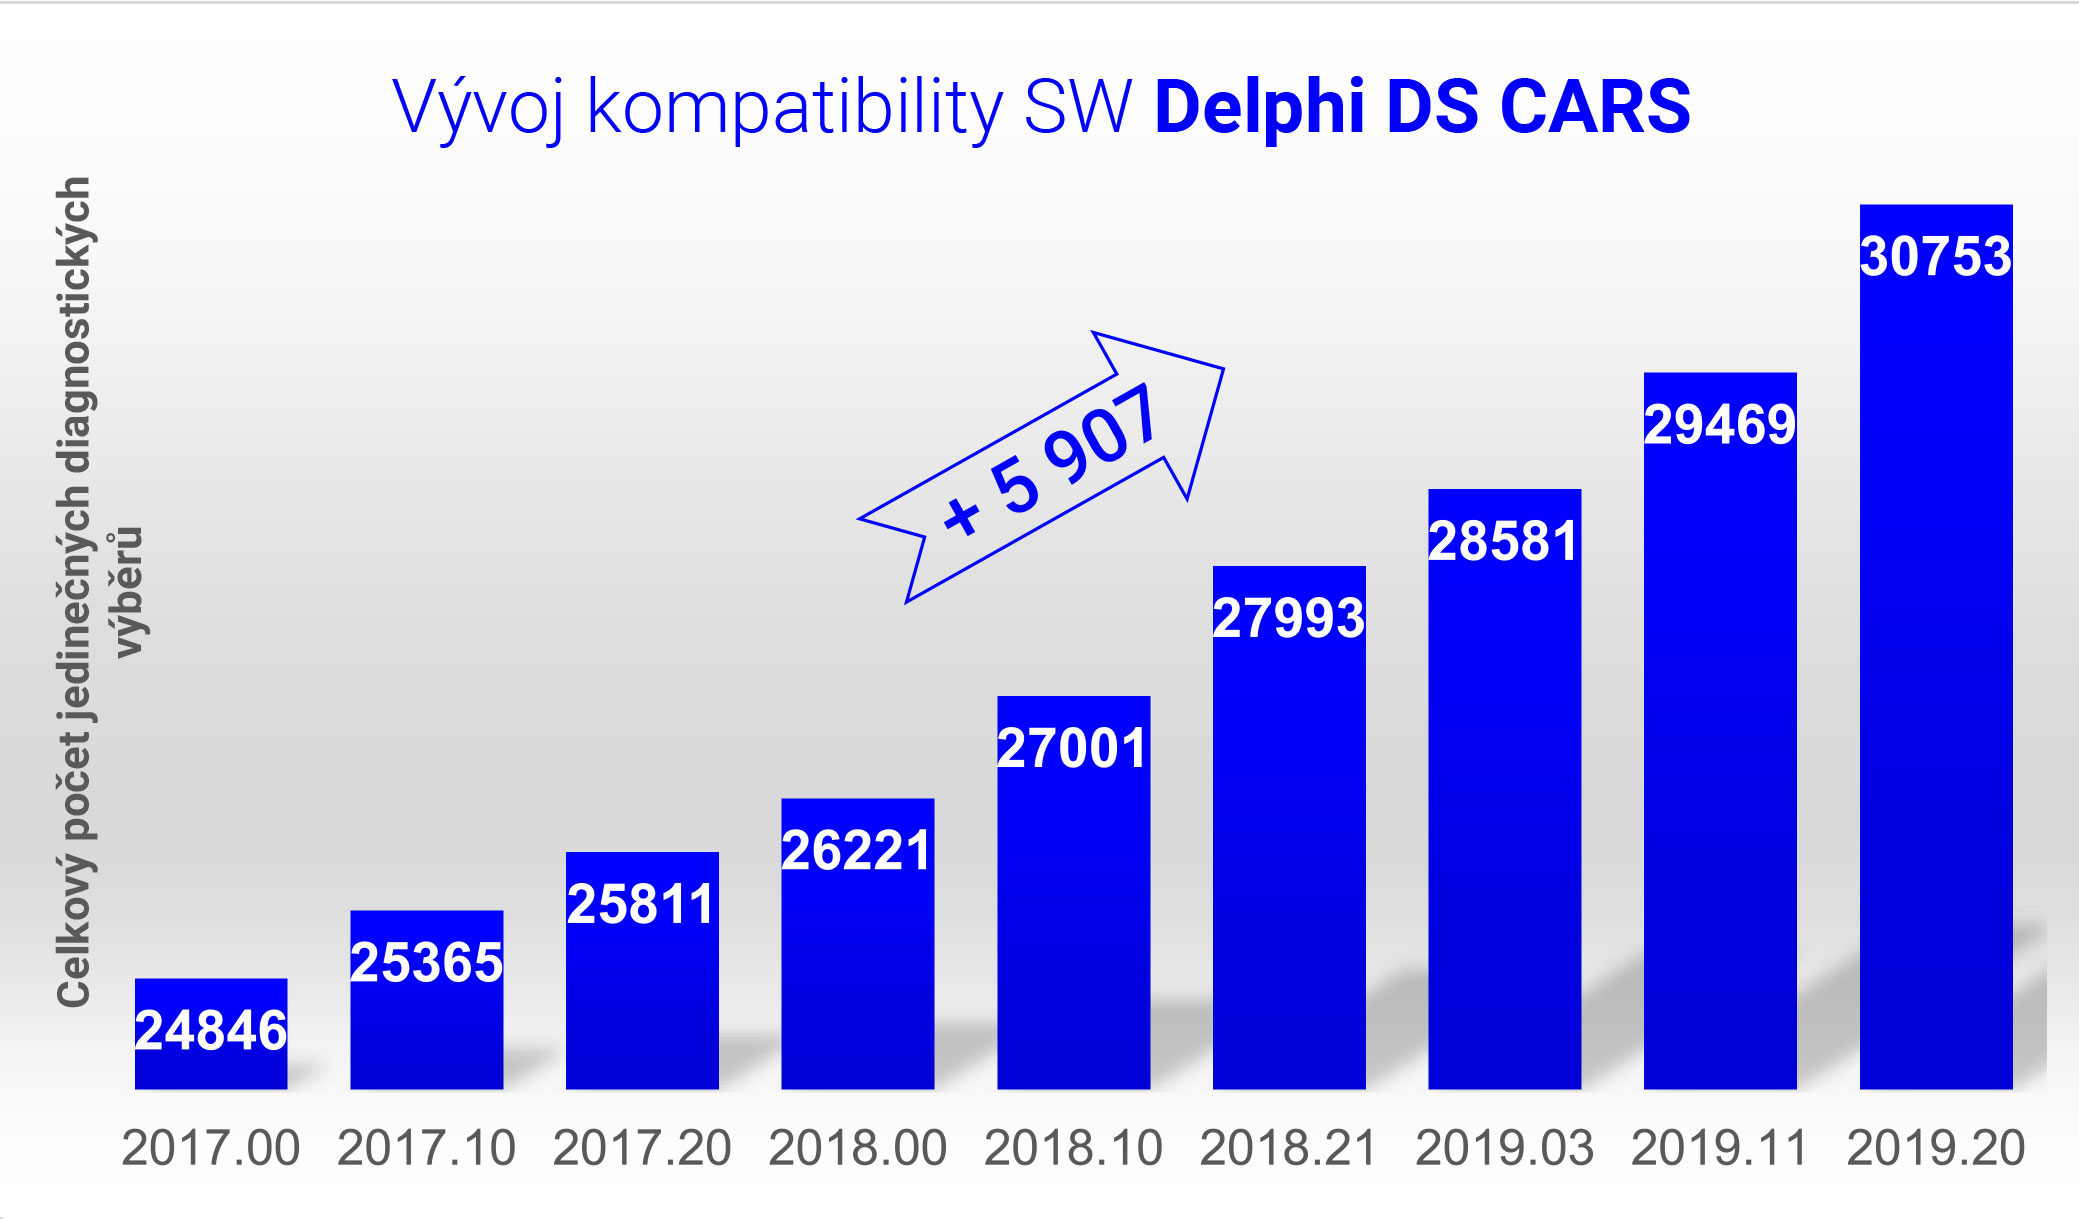 Vyvoj-kompatibility-cars-2019-20